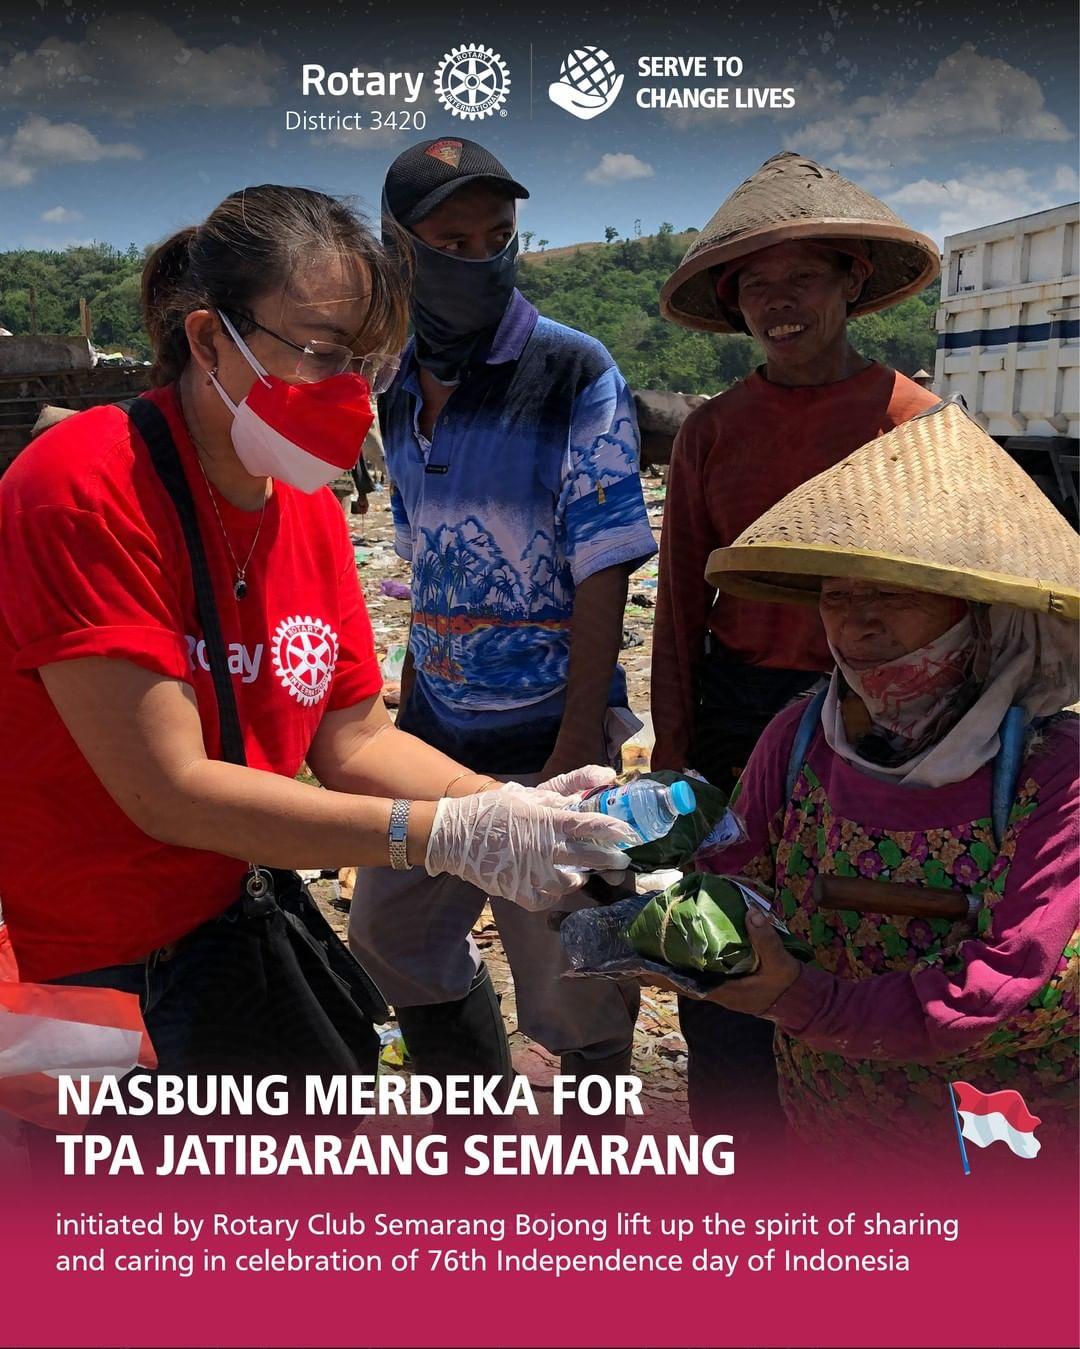 Nasbung Merdeka for TPA Jatibarang Semarang